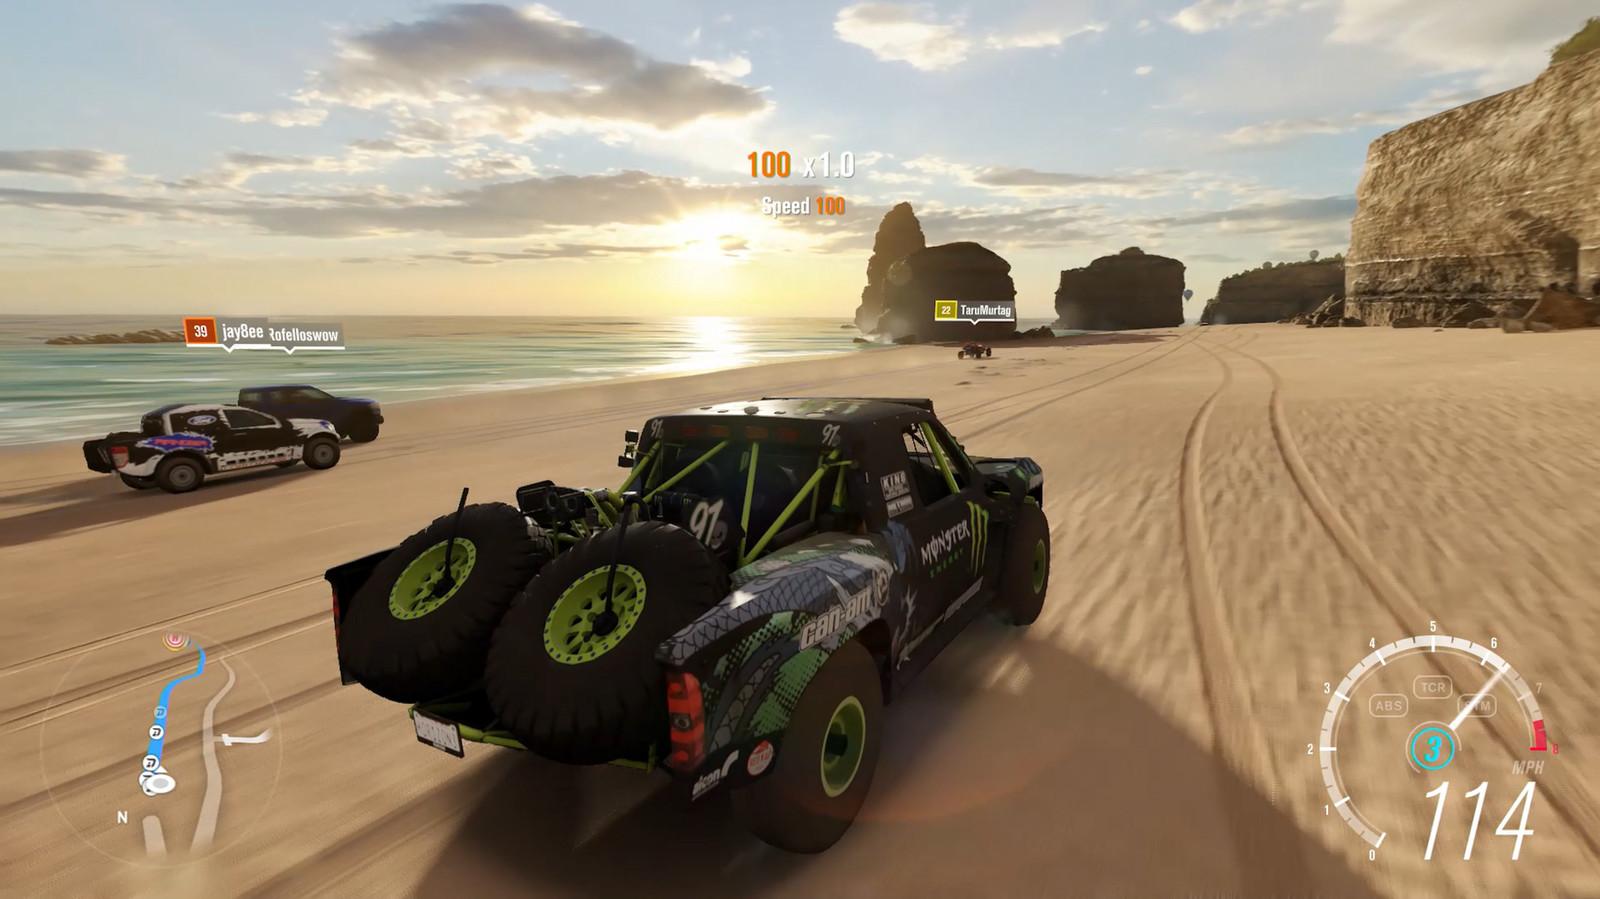 forza horizon 3 геймплей на пляже